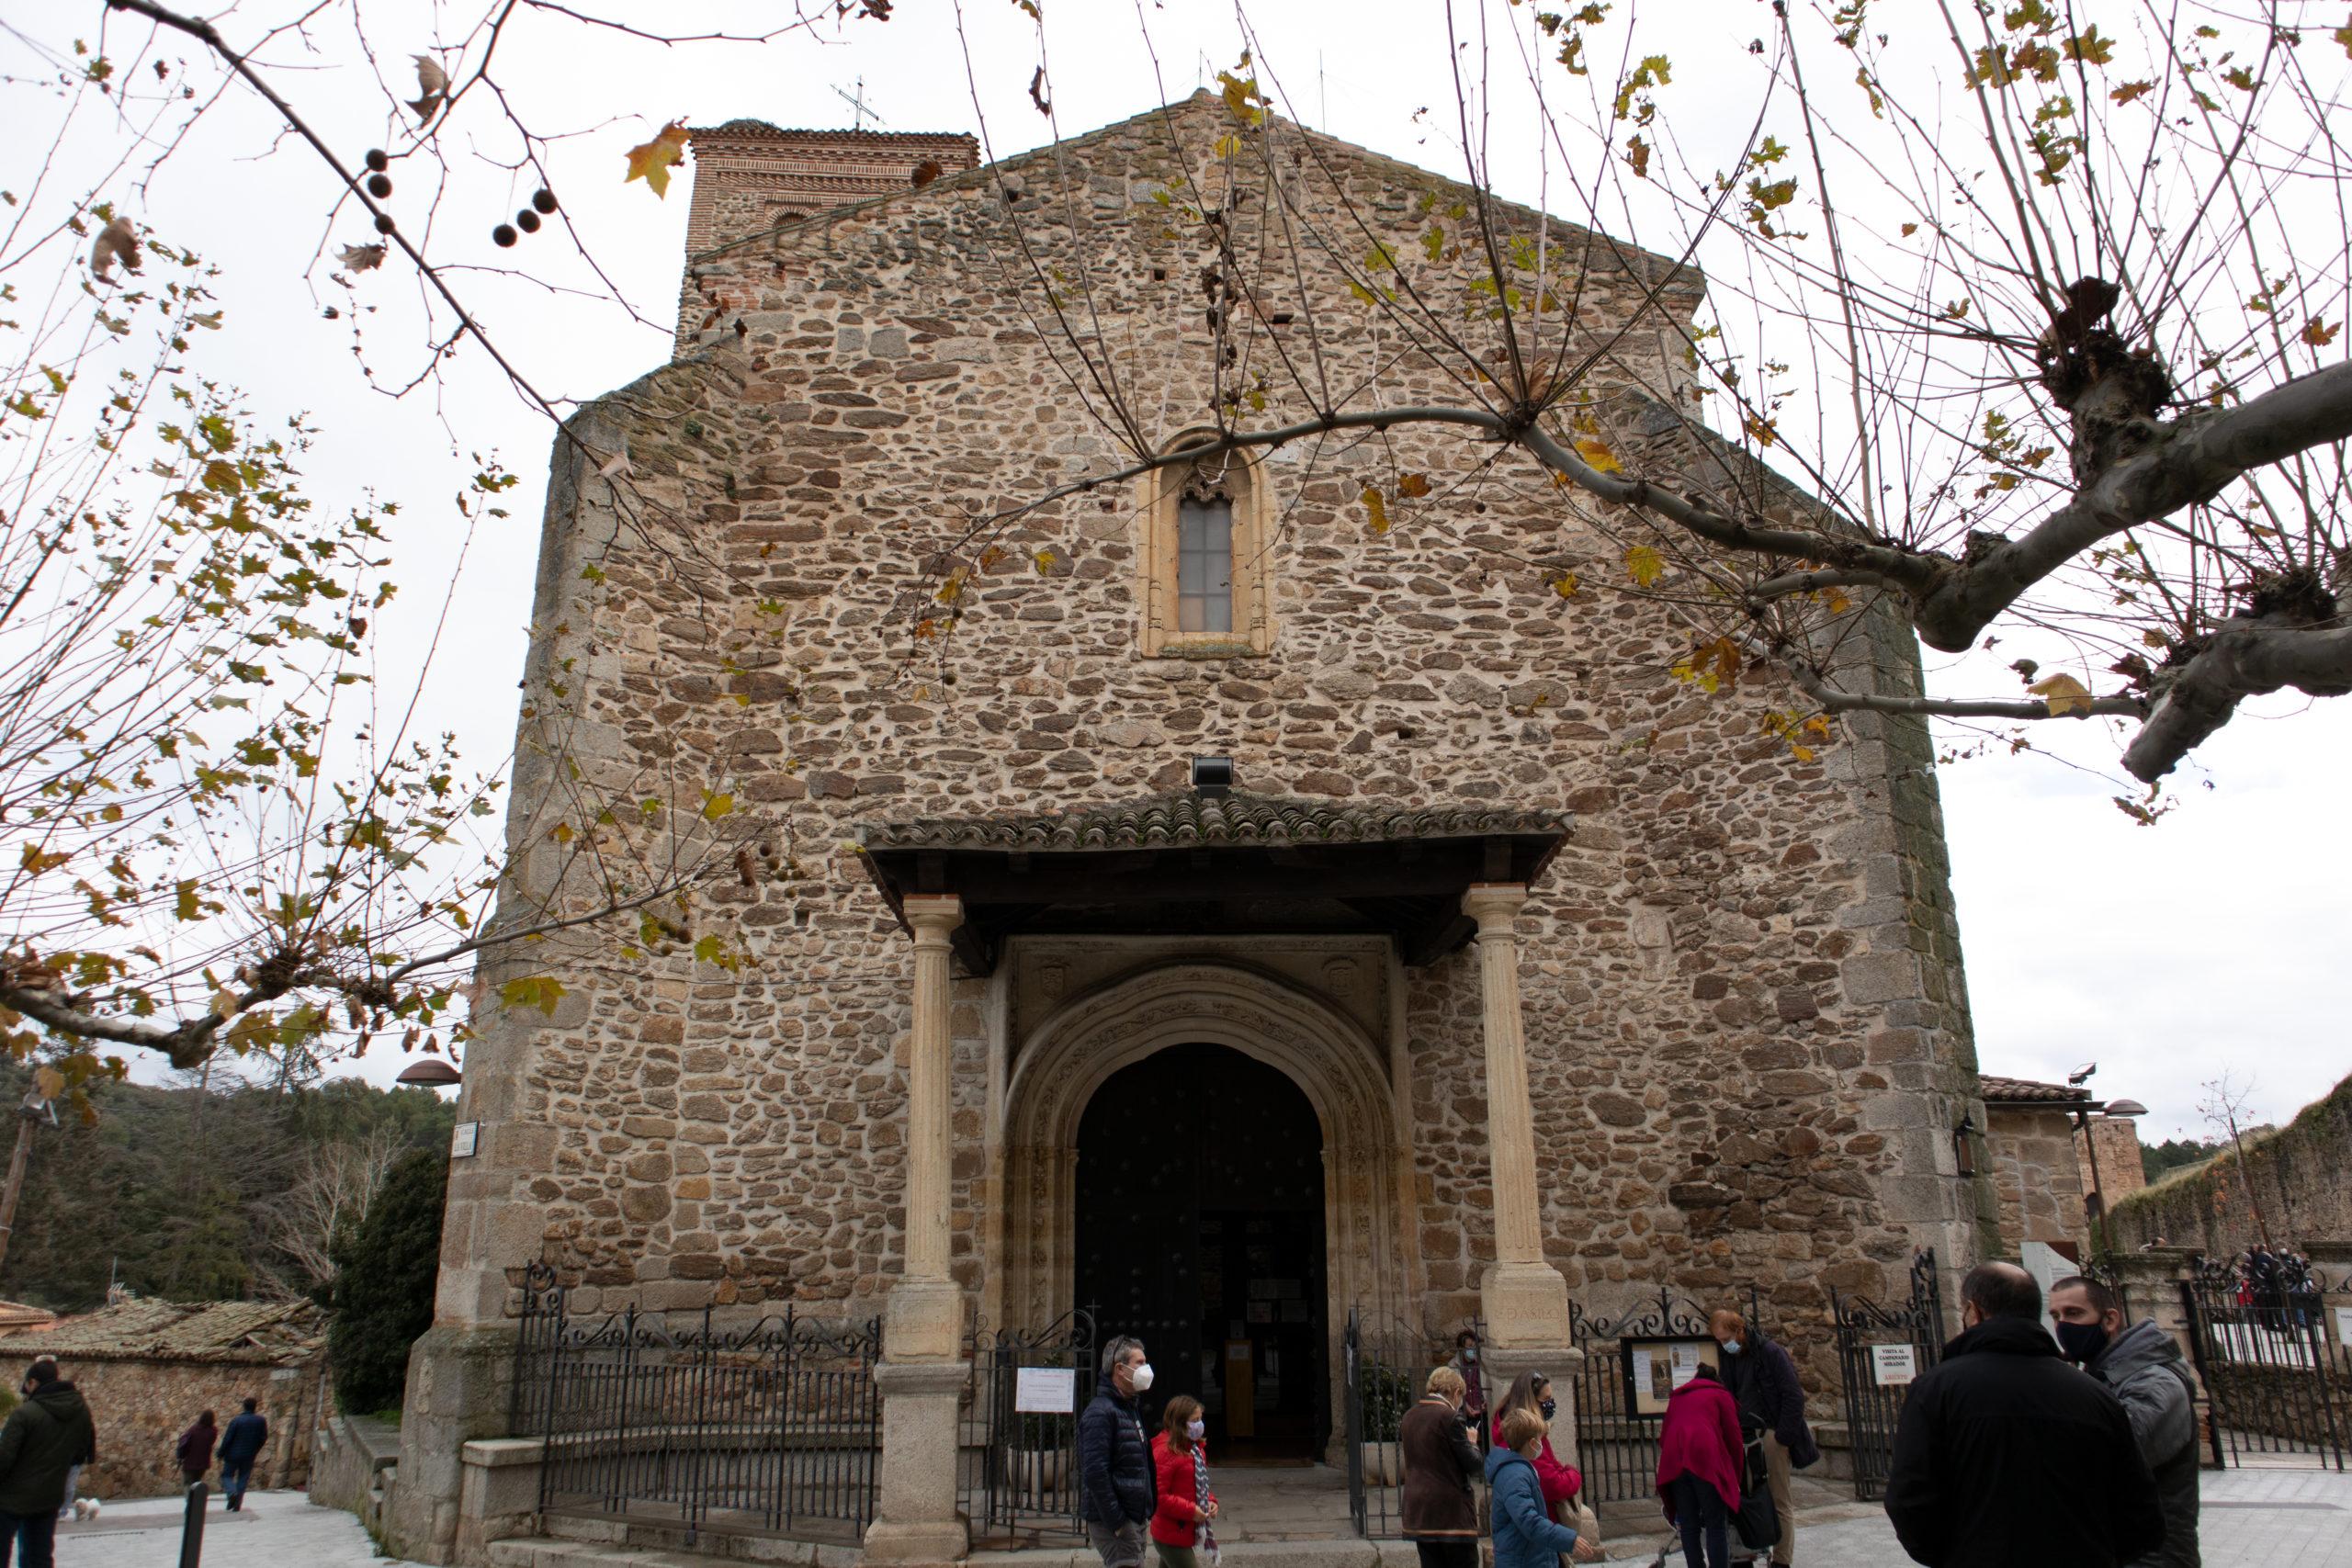 iglesia-castillo-Buitrago-Lozoya